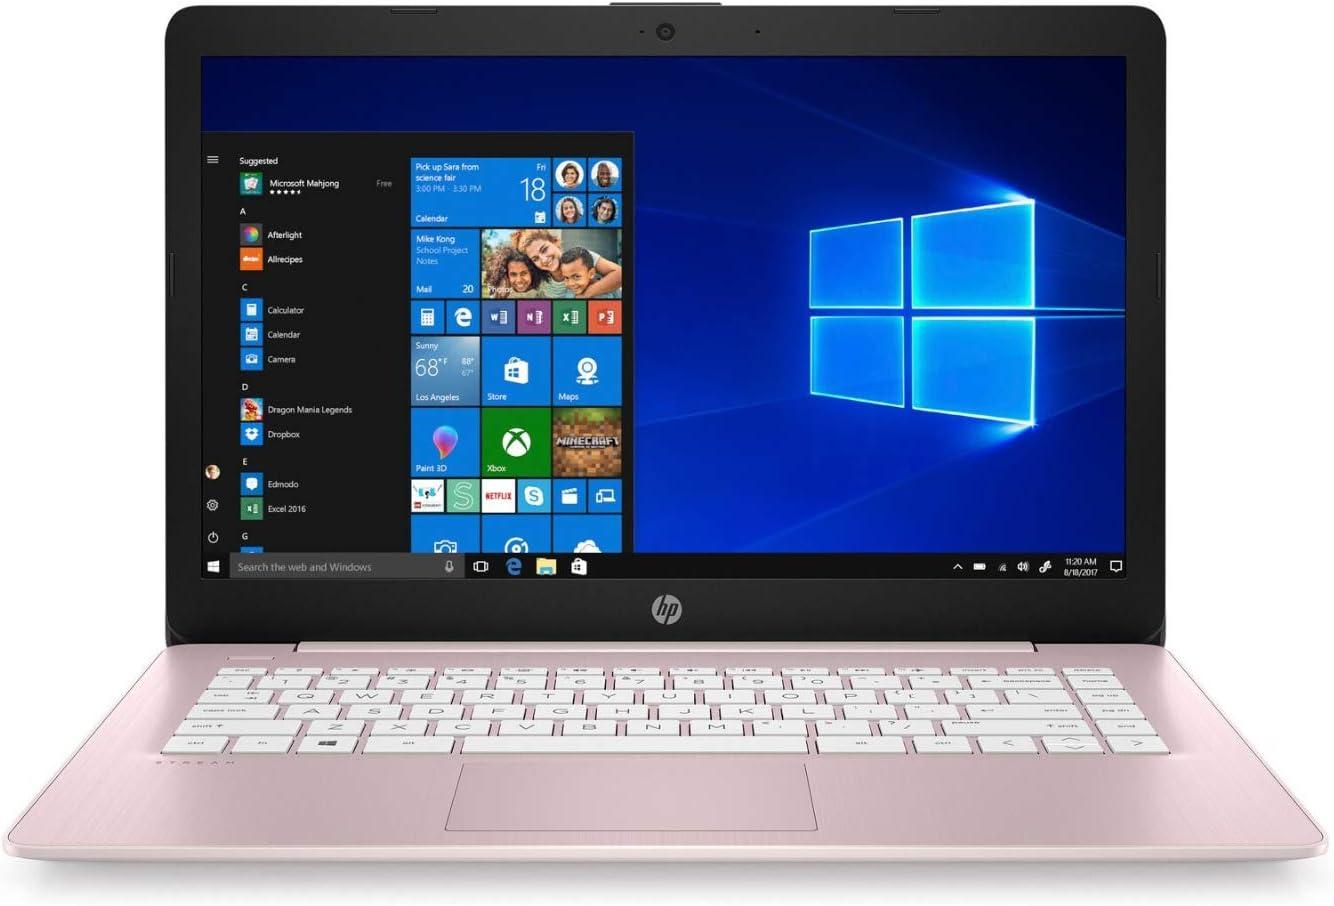 HP Stream 14-cb Laptop Intel Celeron 4GB RAM 64GB eMMC 14-inch HD WLED Office 365 Personal 1-Year Win 10 s